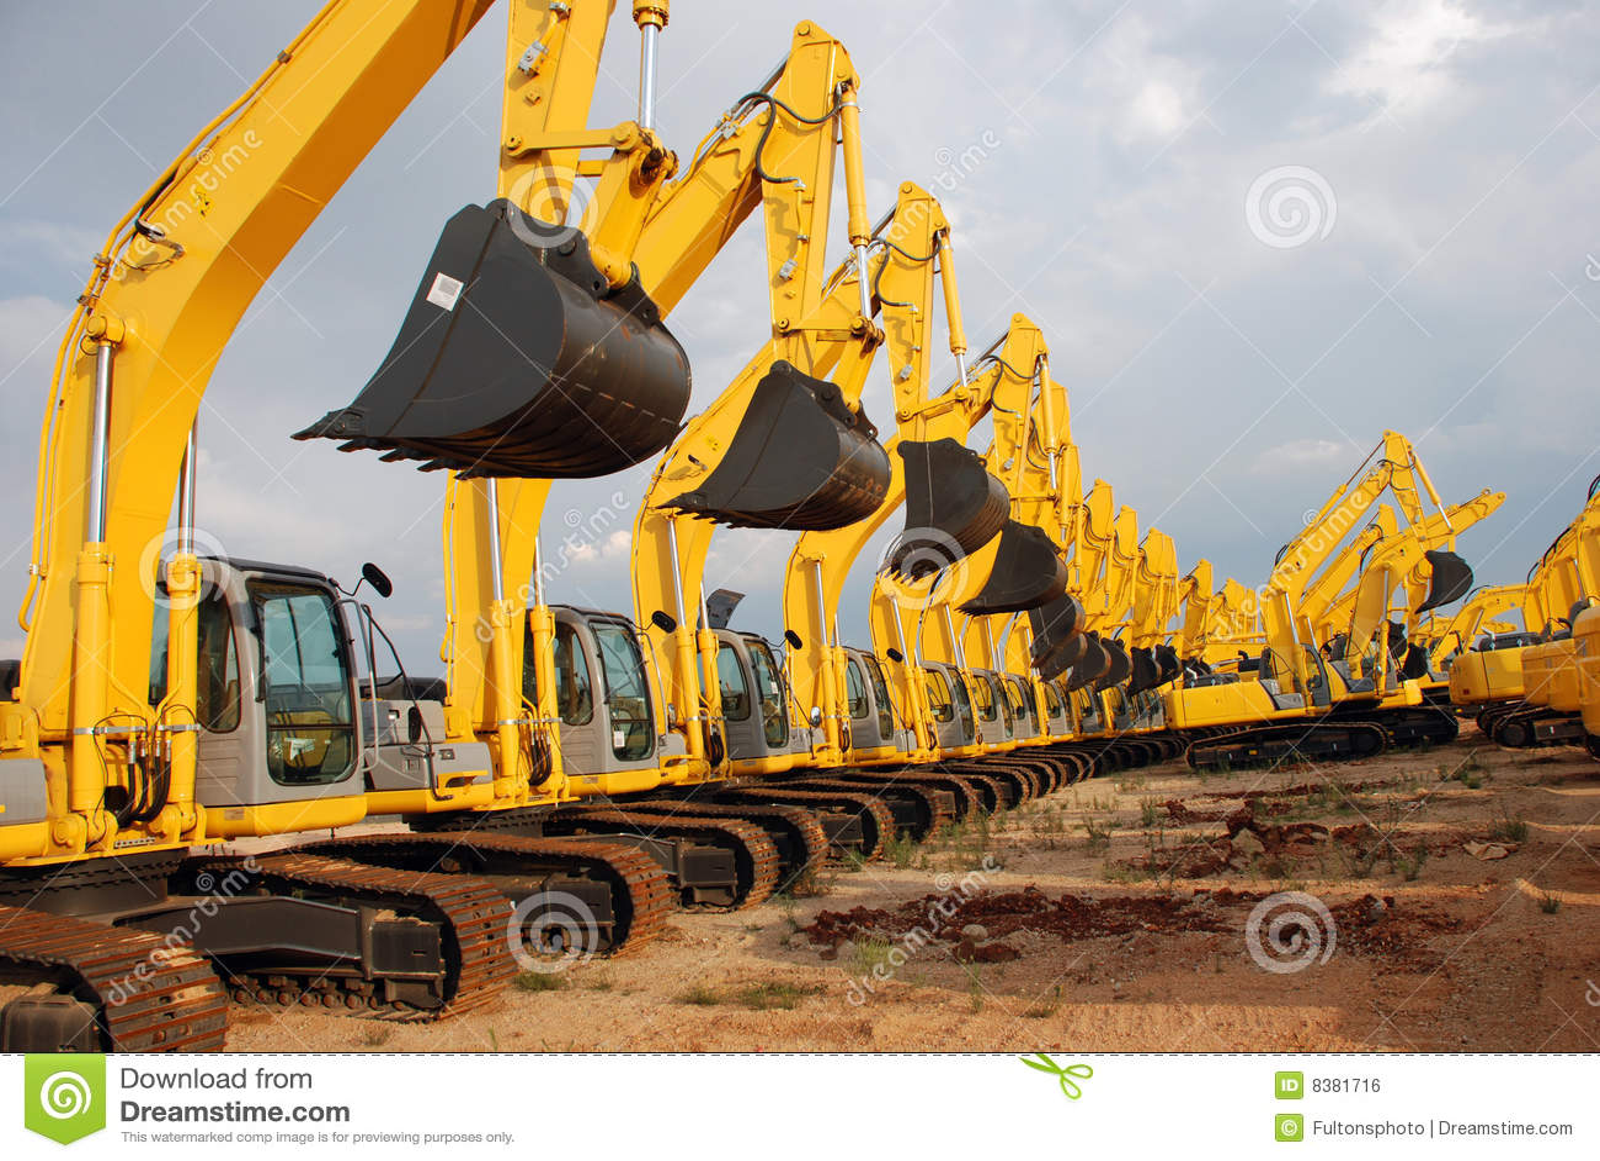 Excavator Construction Equipment